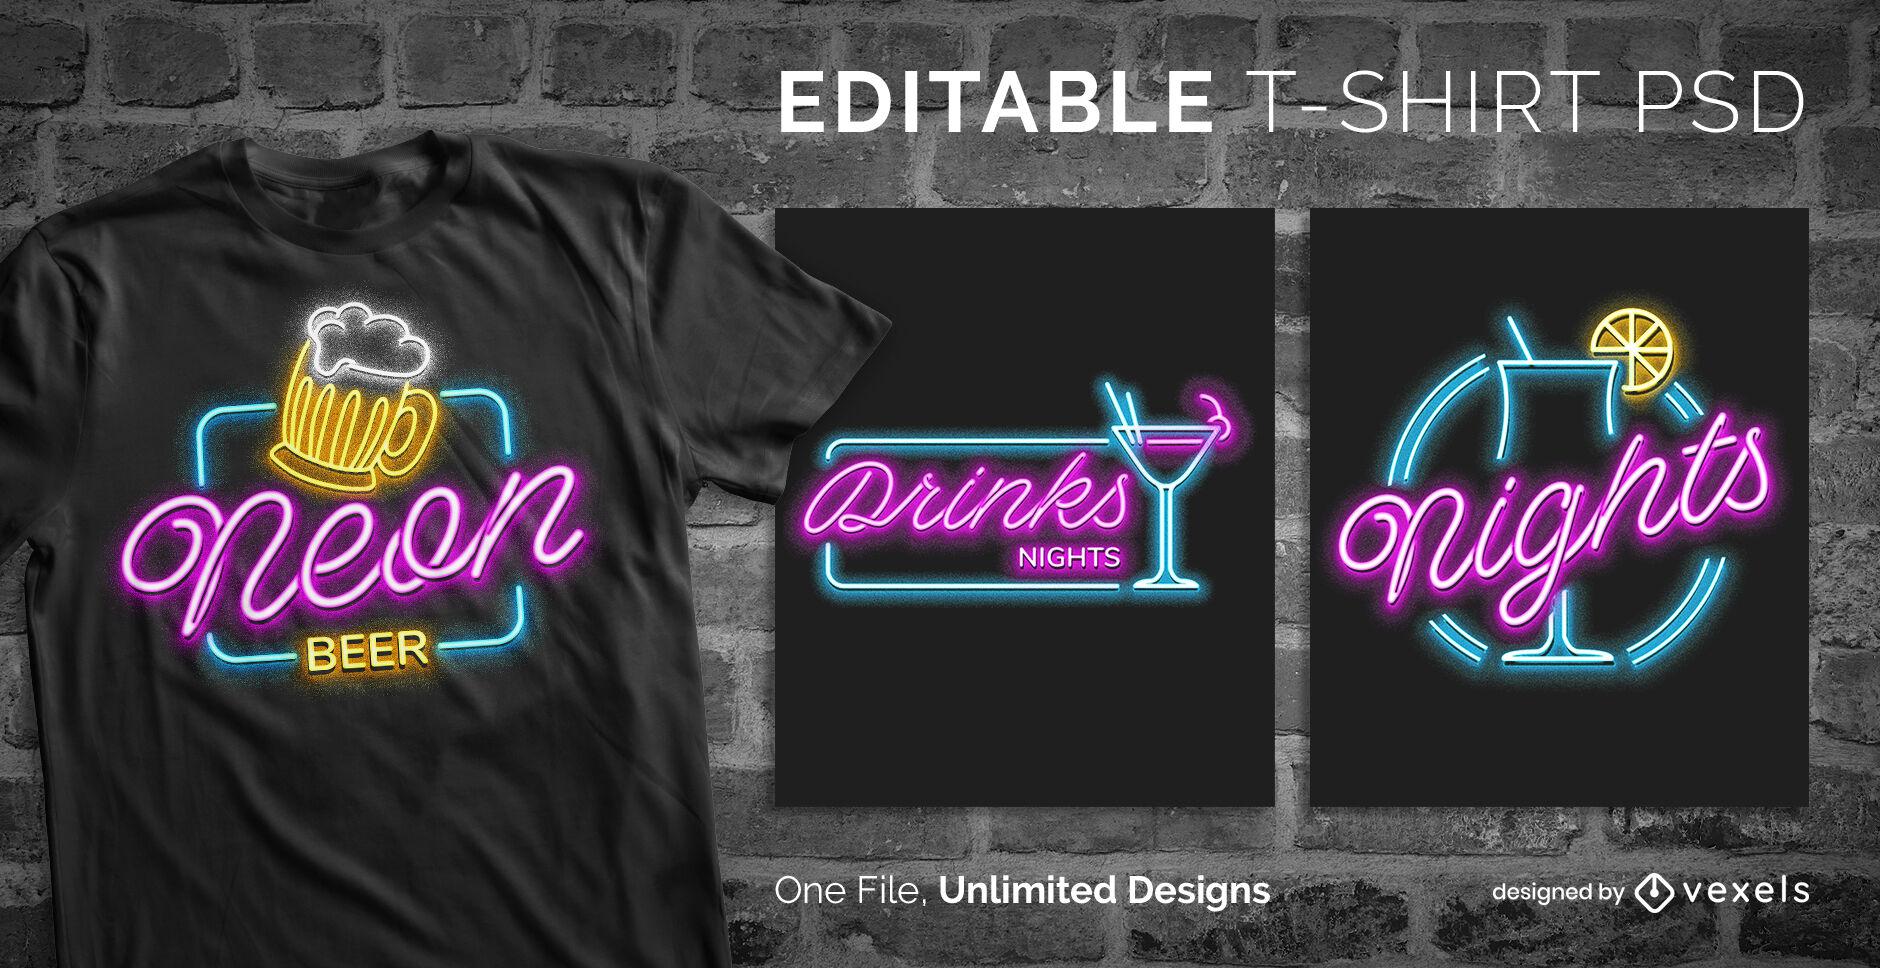 Neon sign editable psd t-shirt